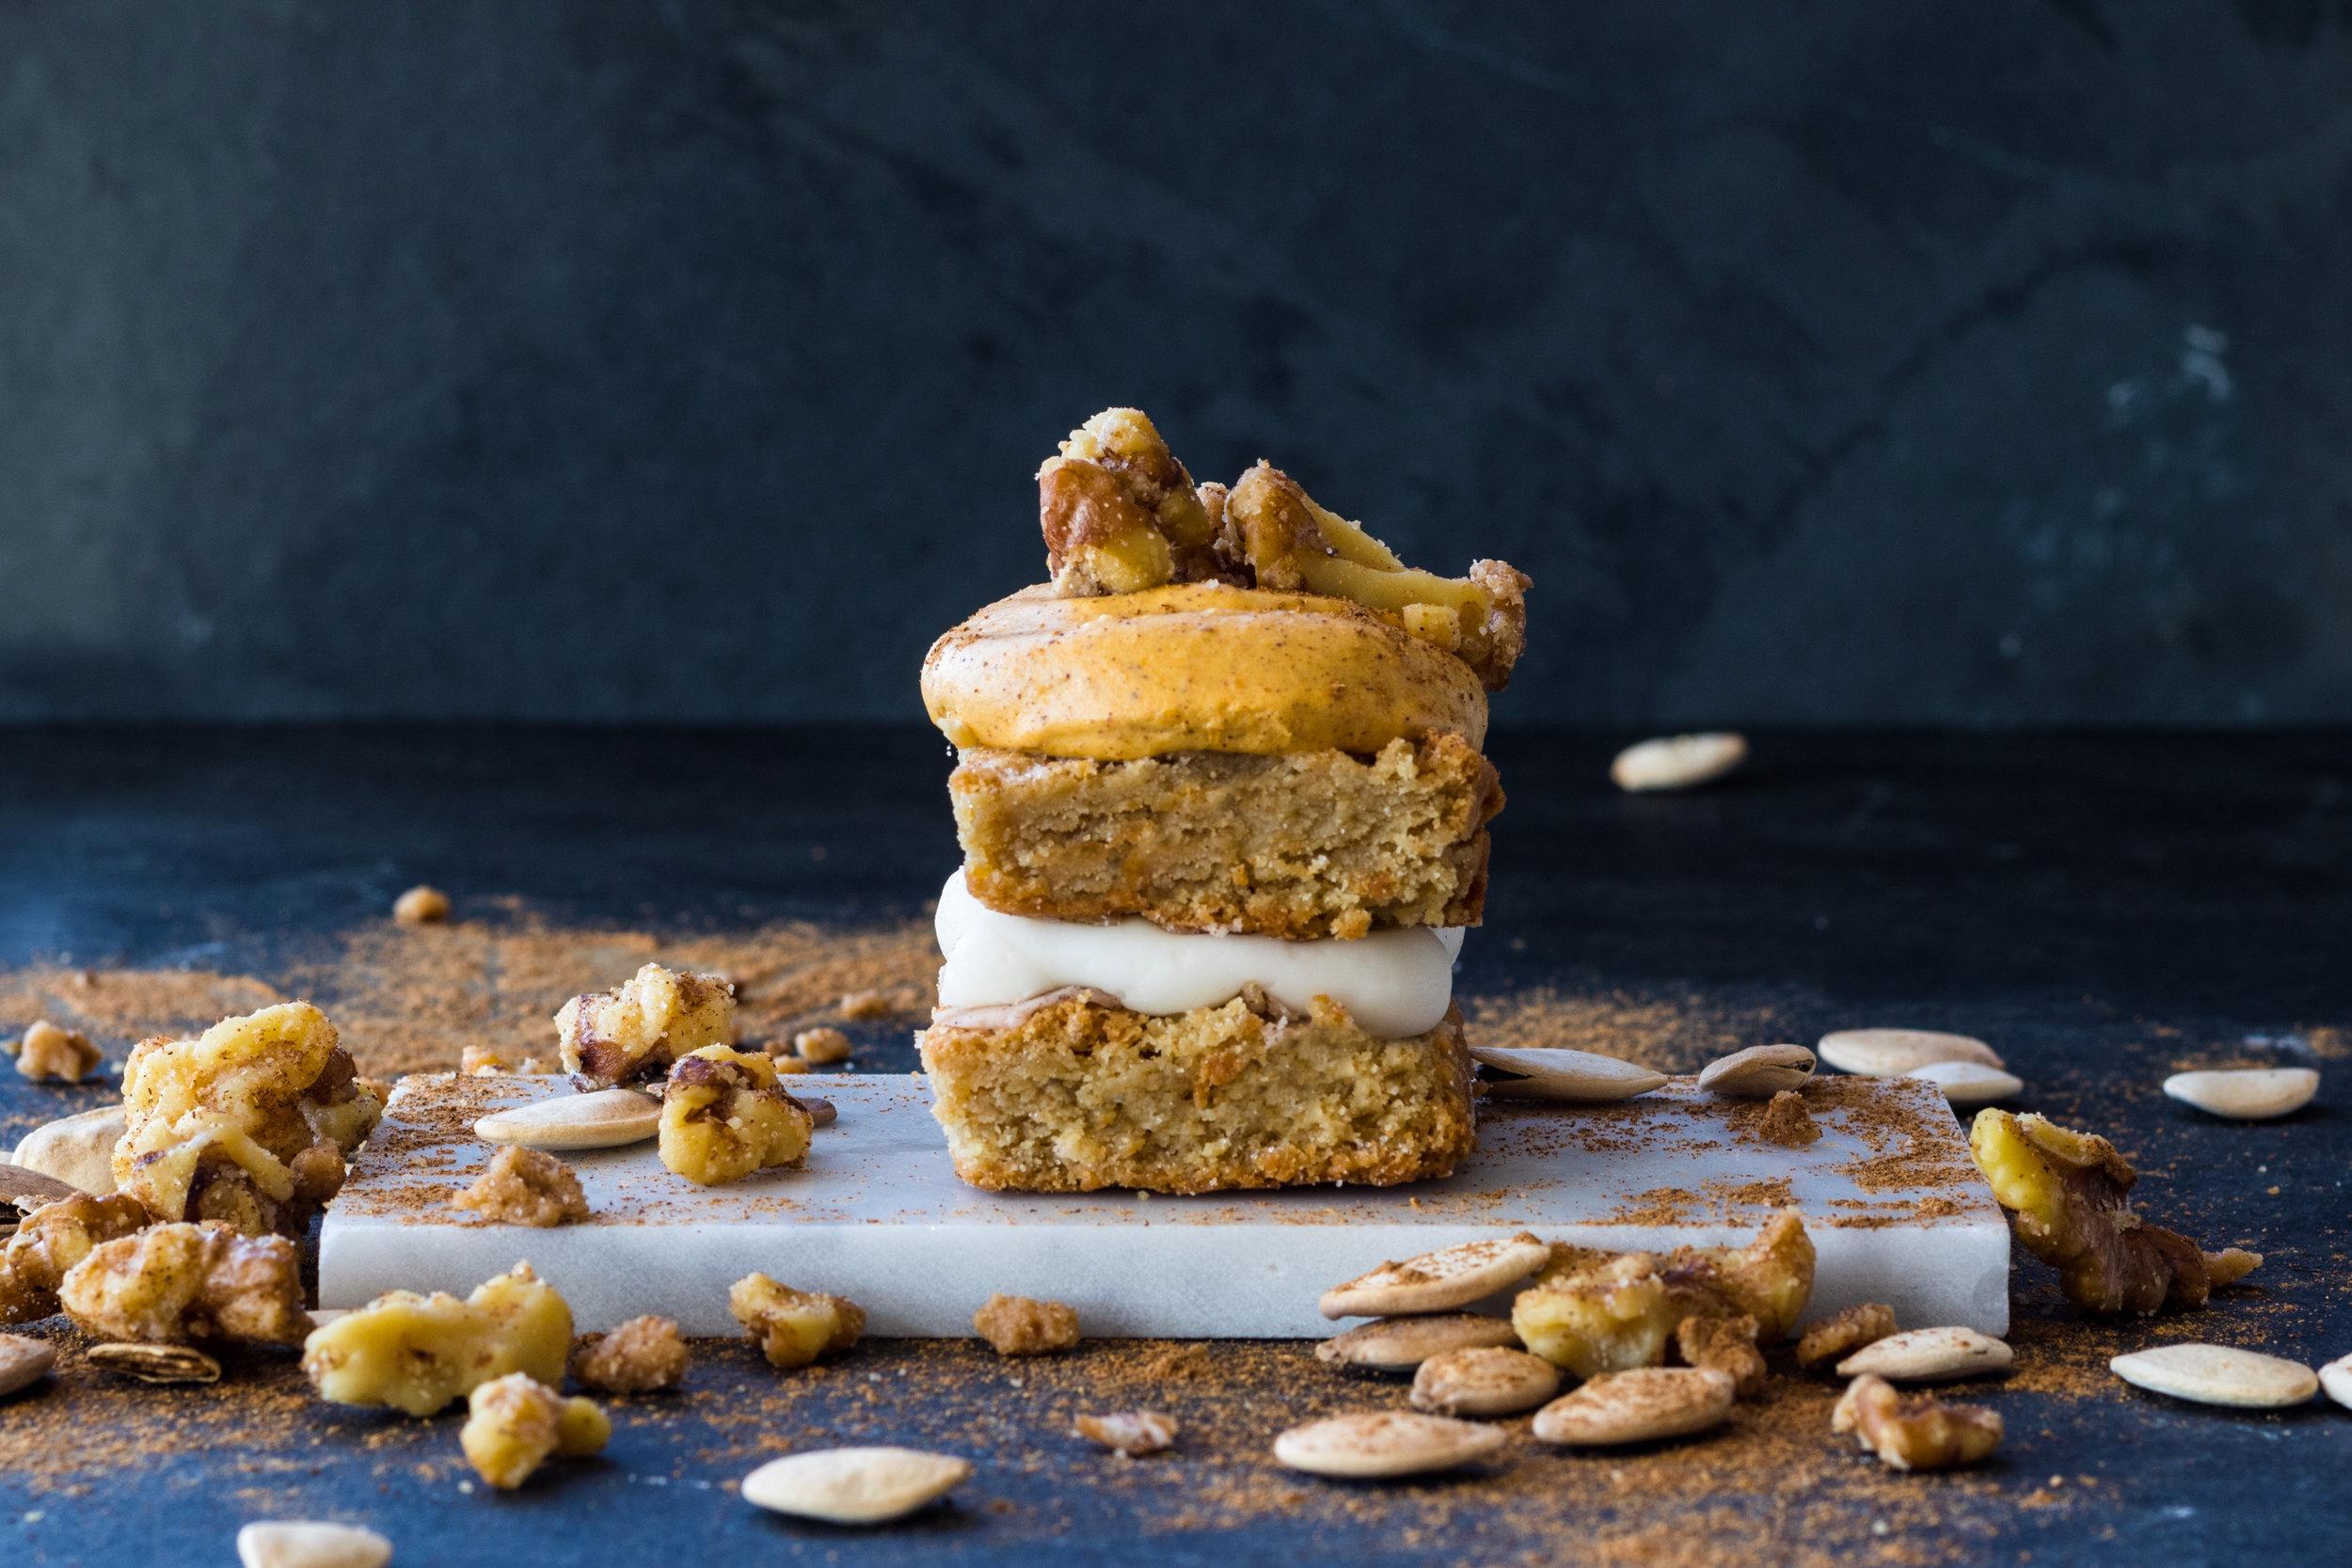 PUMPKIN SPICE (seasonal): Pumpkin cheesecake, sugared walnuts, spiced sprinkles, cheesecake filling, blondie base